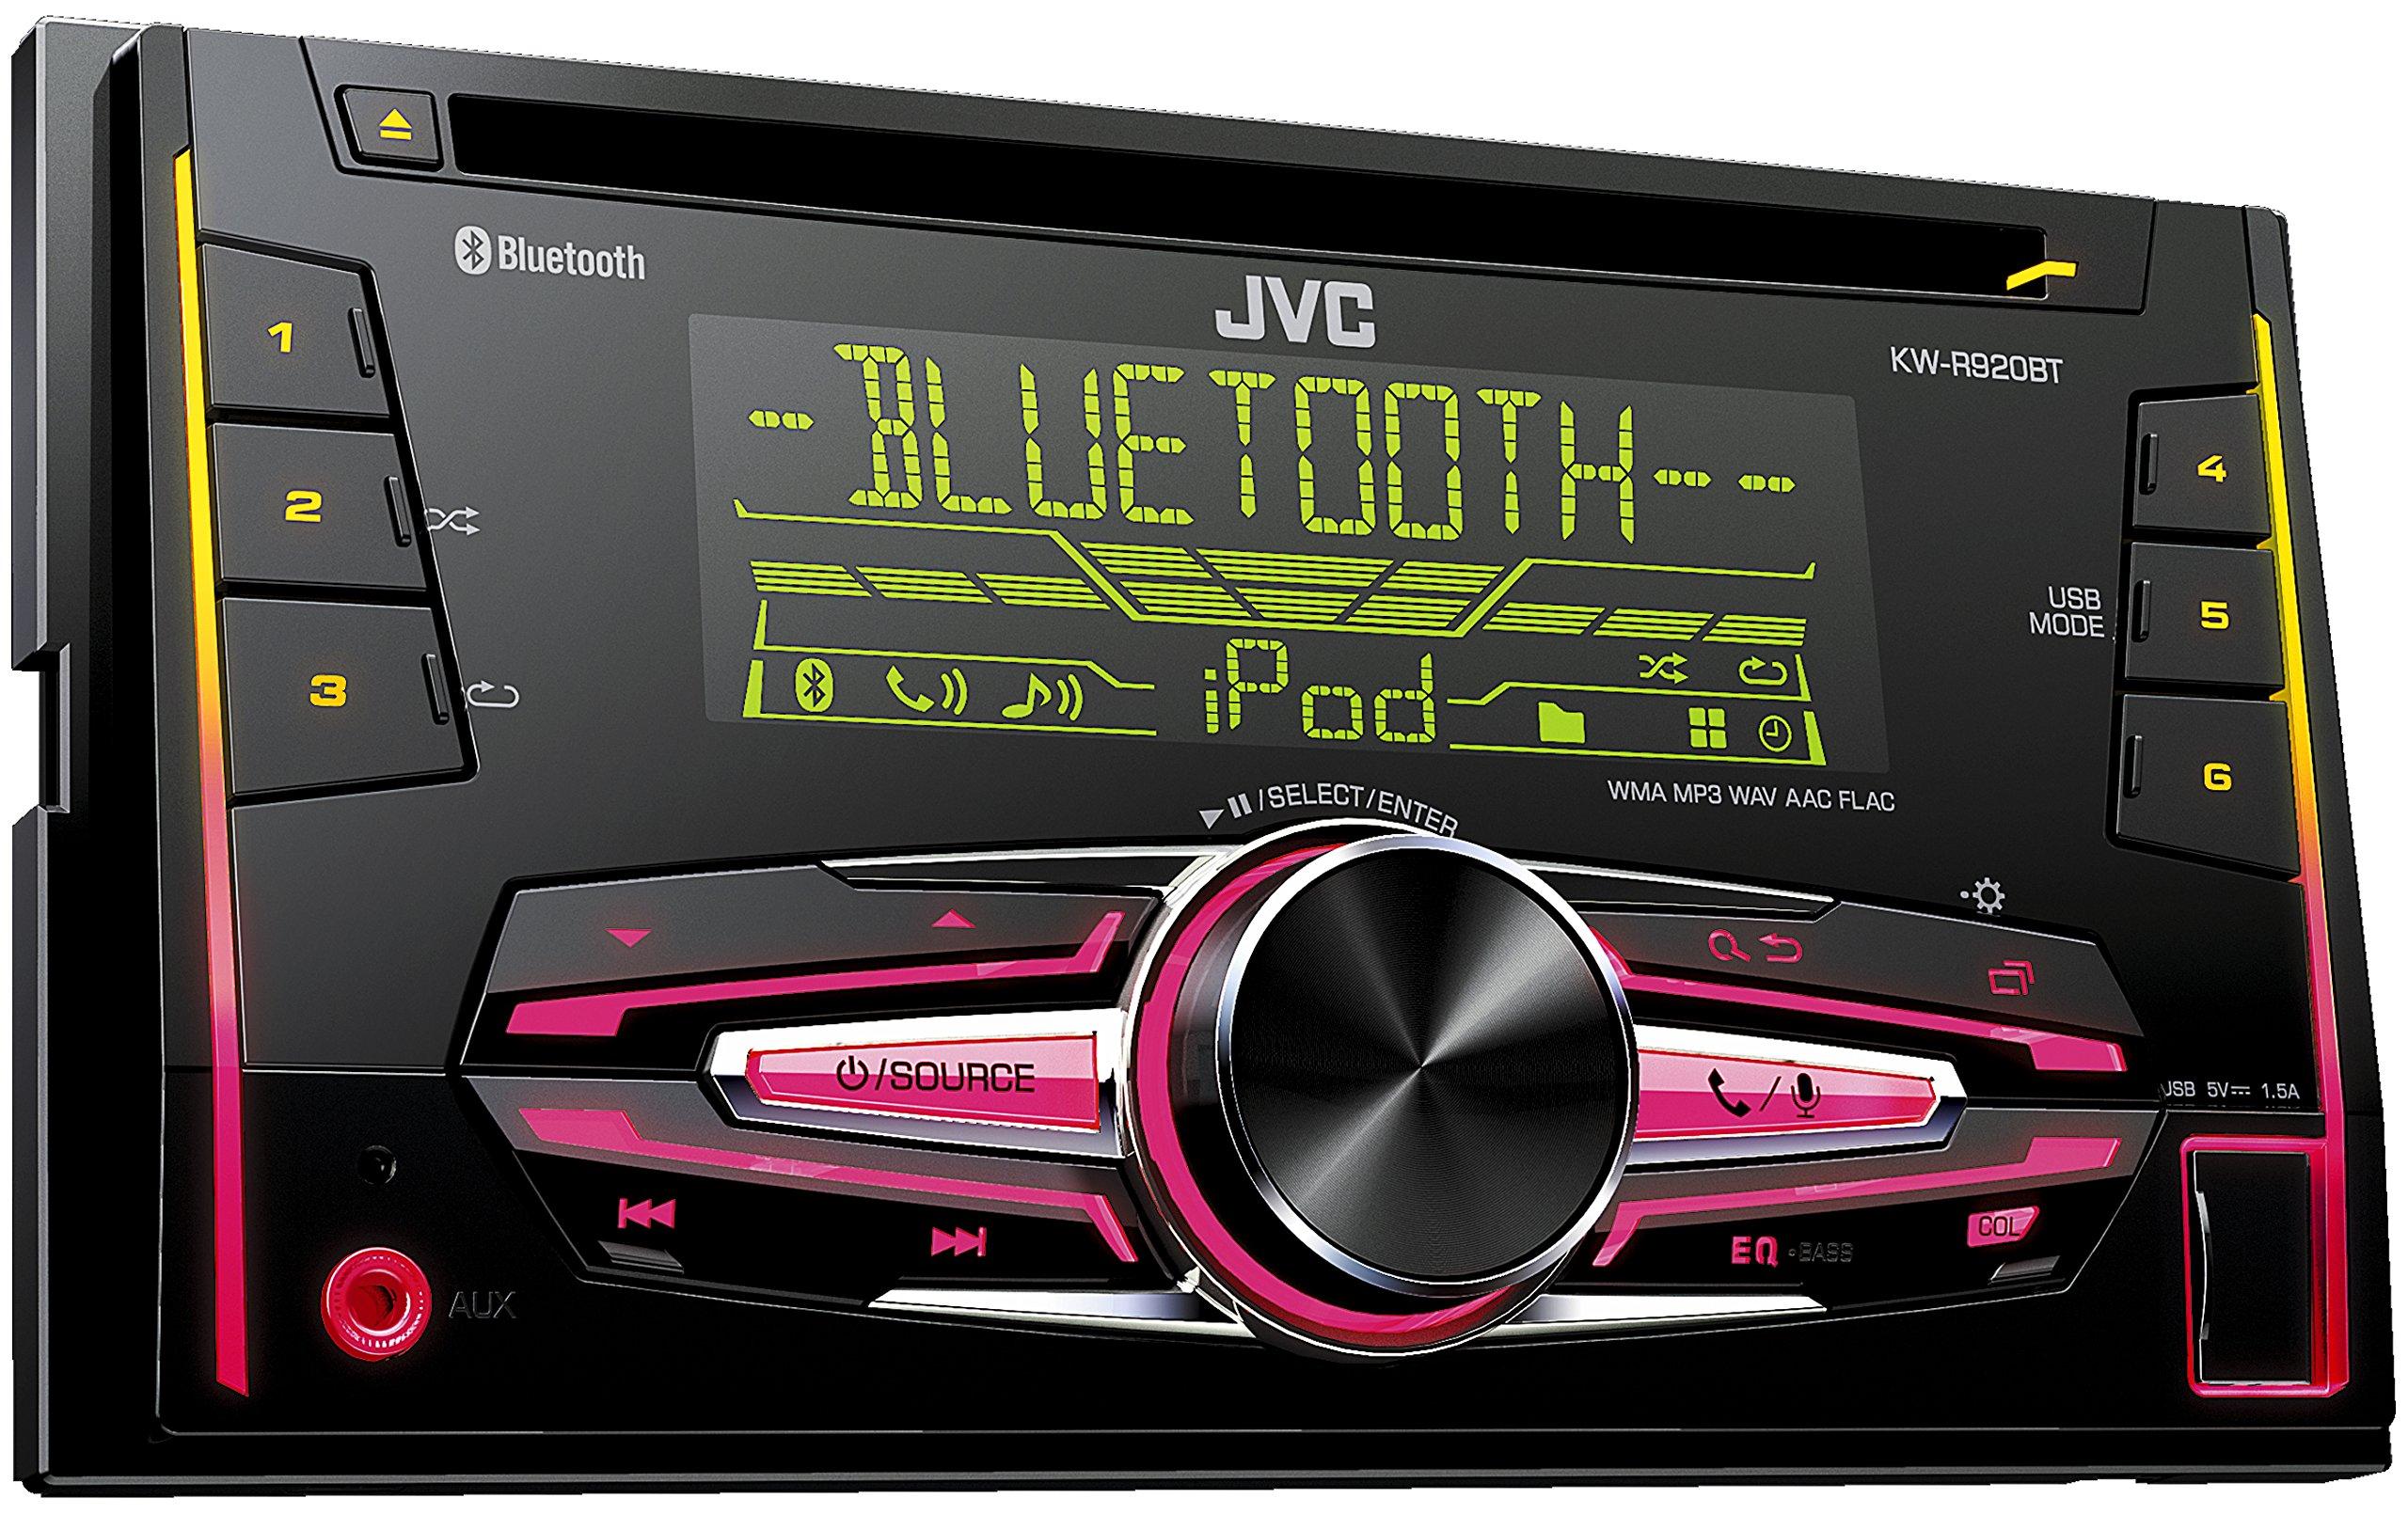 JVC-KW-Doppel-DIN-USBCD-Receiver-mit-Front-AUX-Eingang